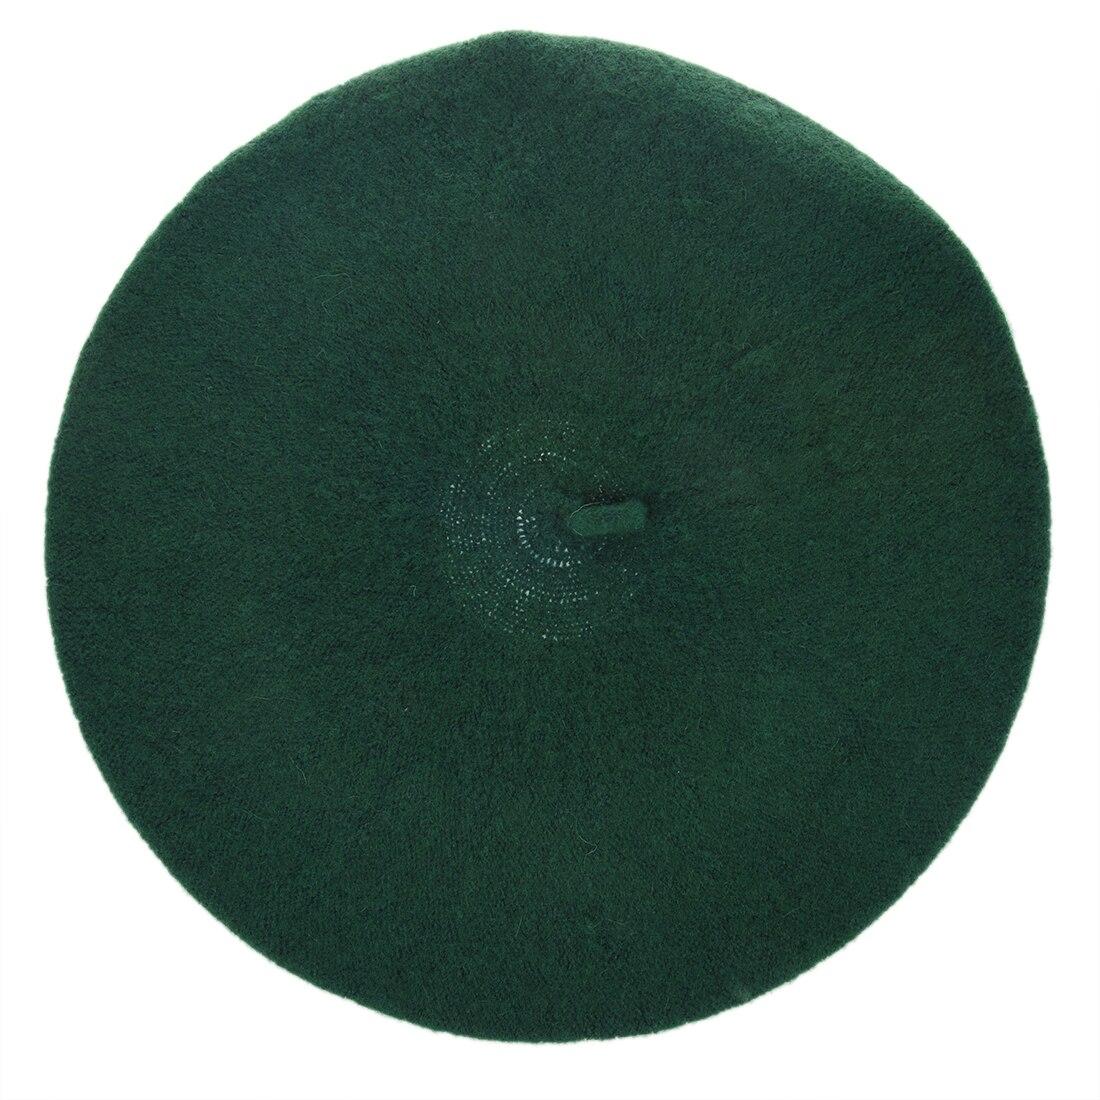 0a2cbd04 Women's Fashion Casual Beret Beanie Hat dark green-in Women's Berets ...